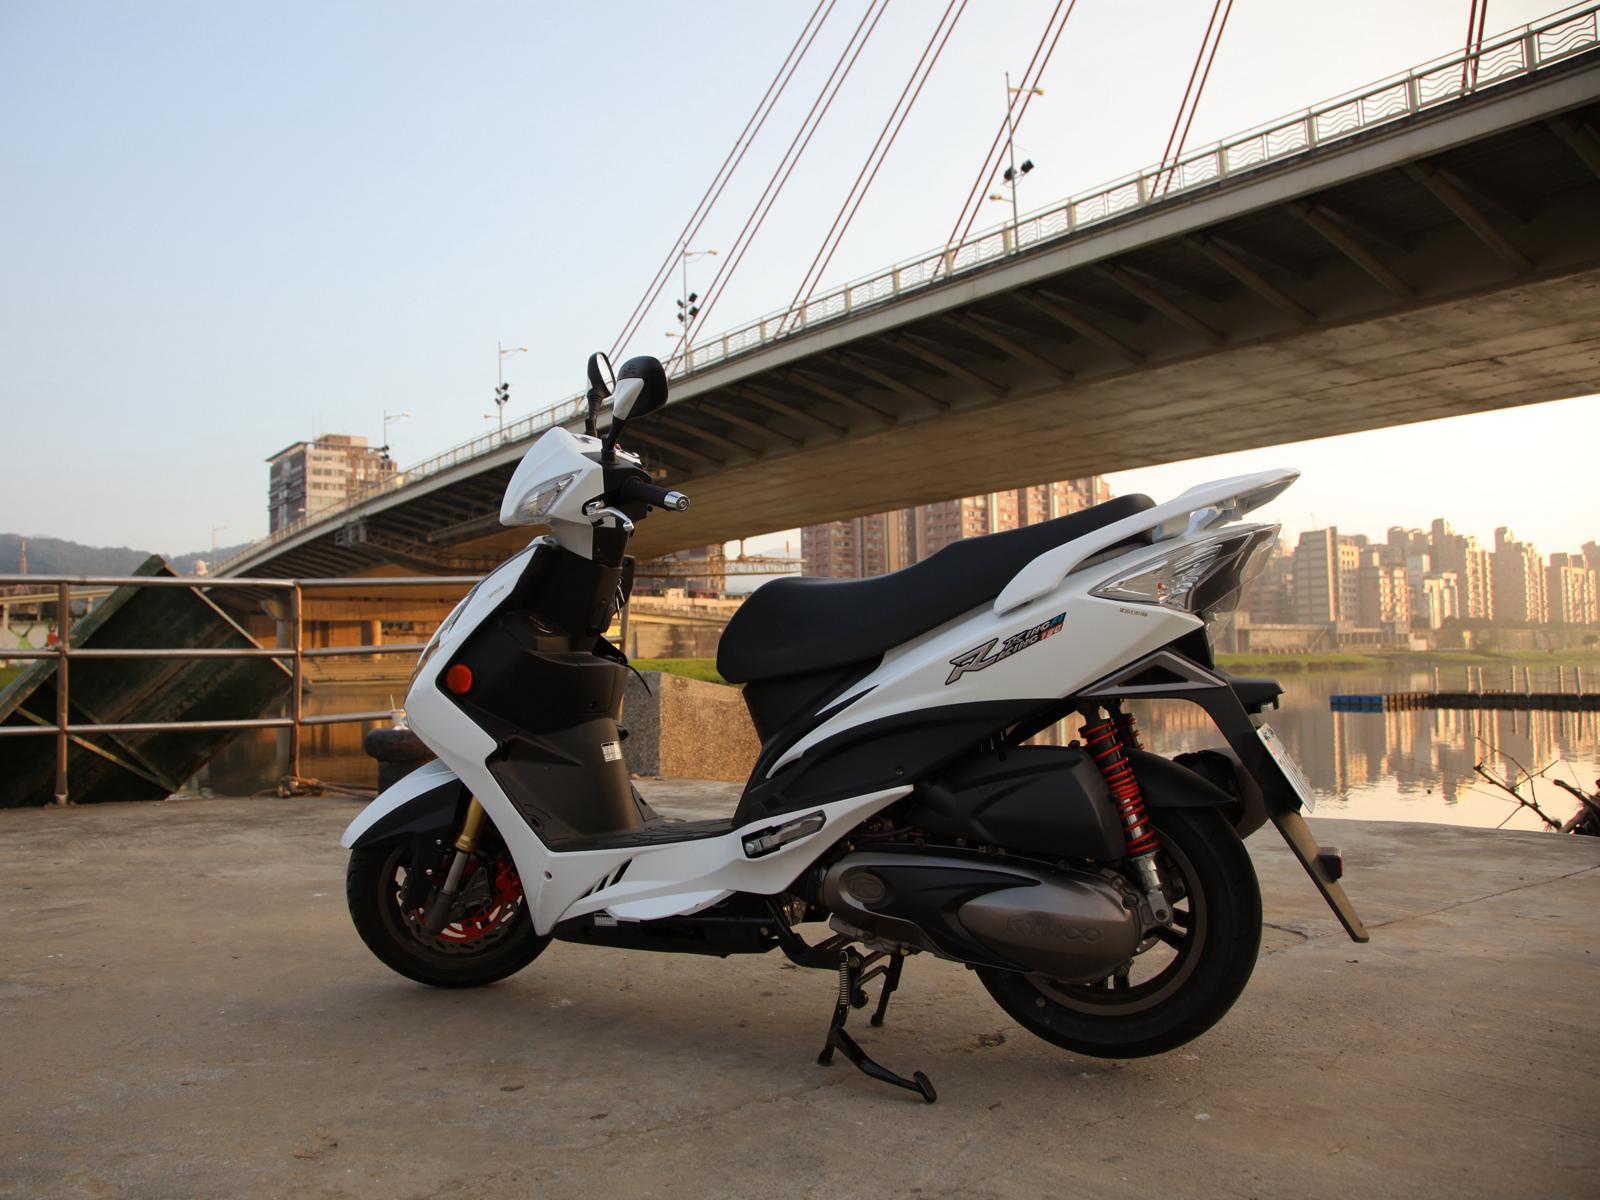 R Nine T >> 【光阳 劲丽GP110】_摩托车图片库_摩托车之家